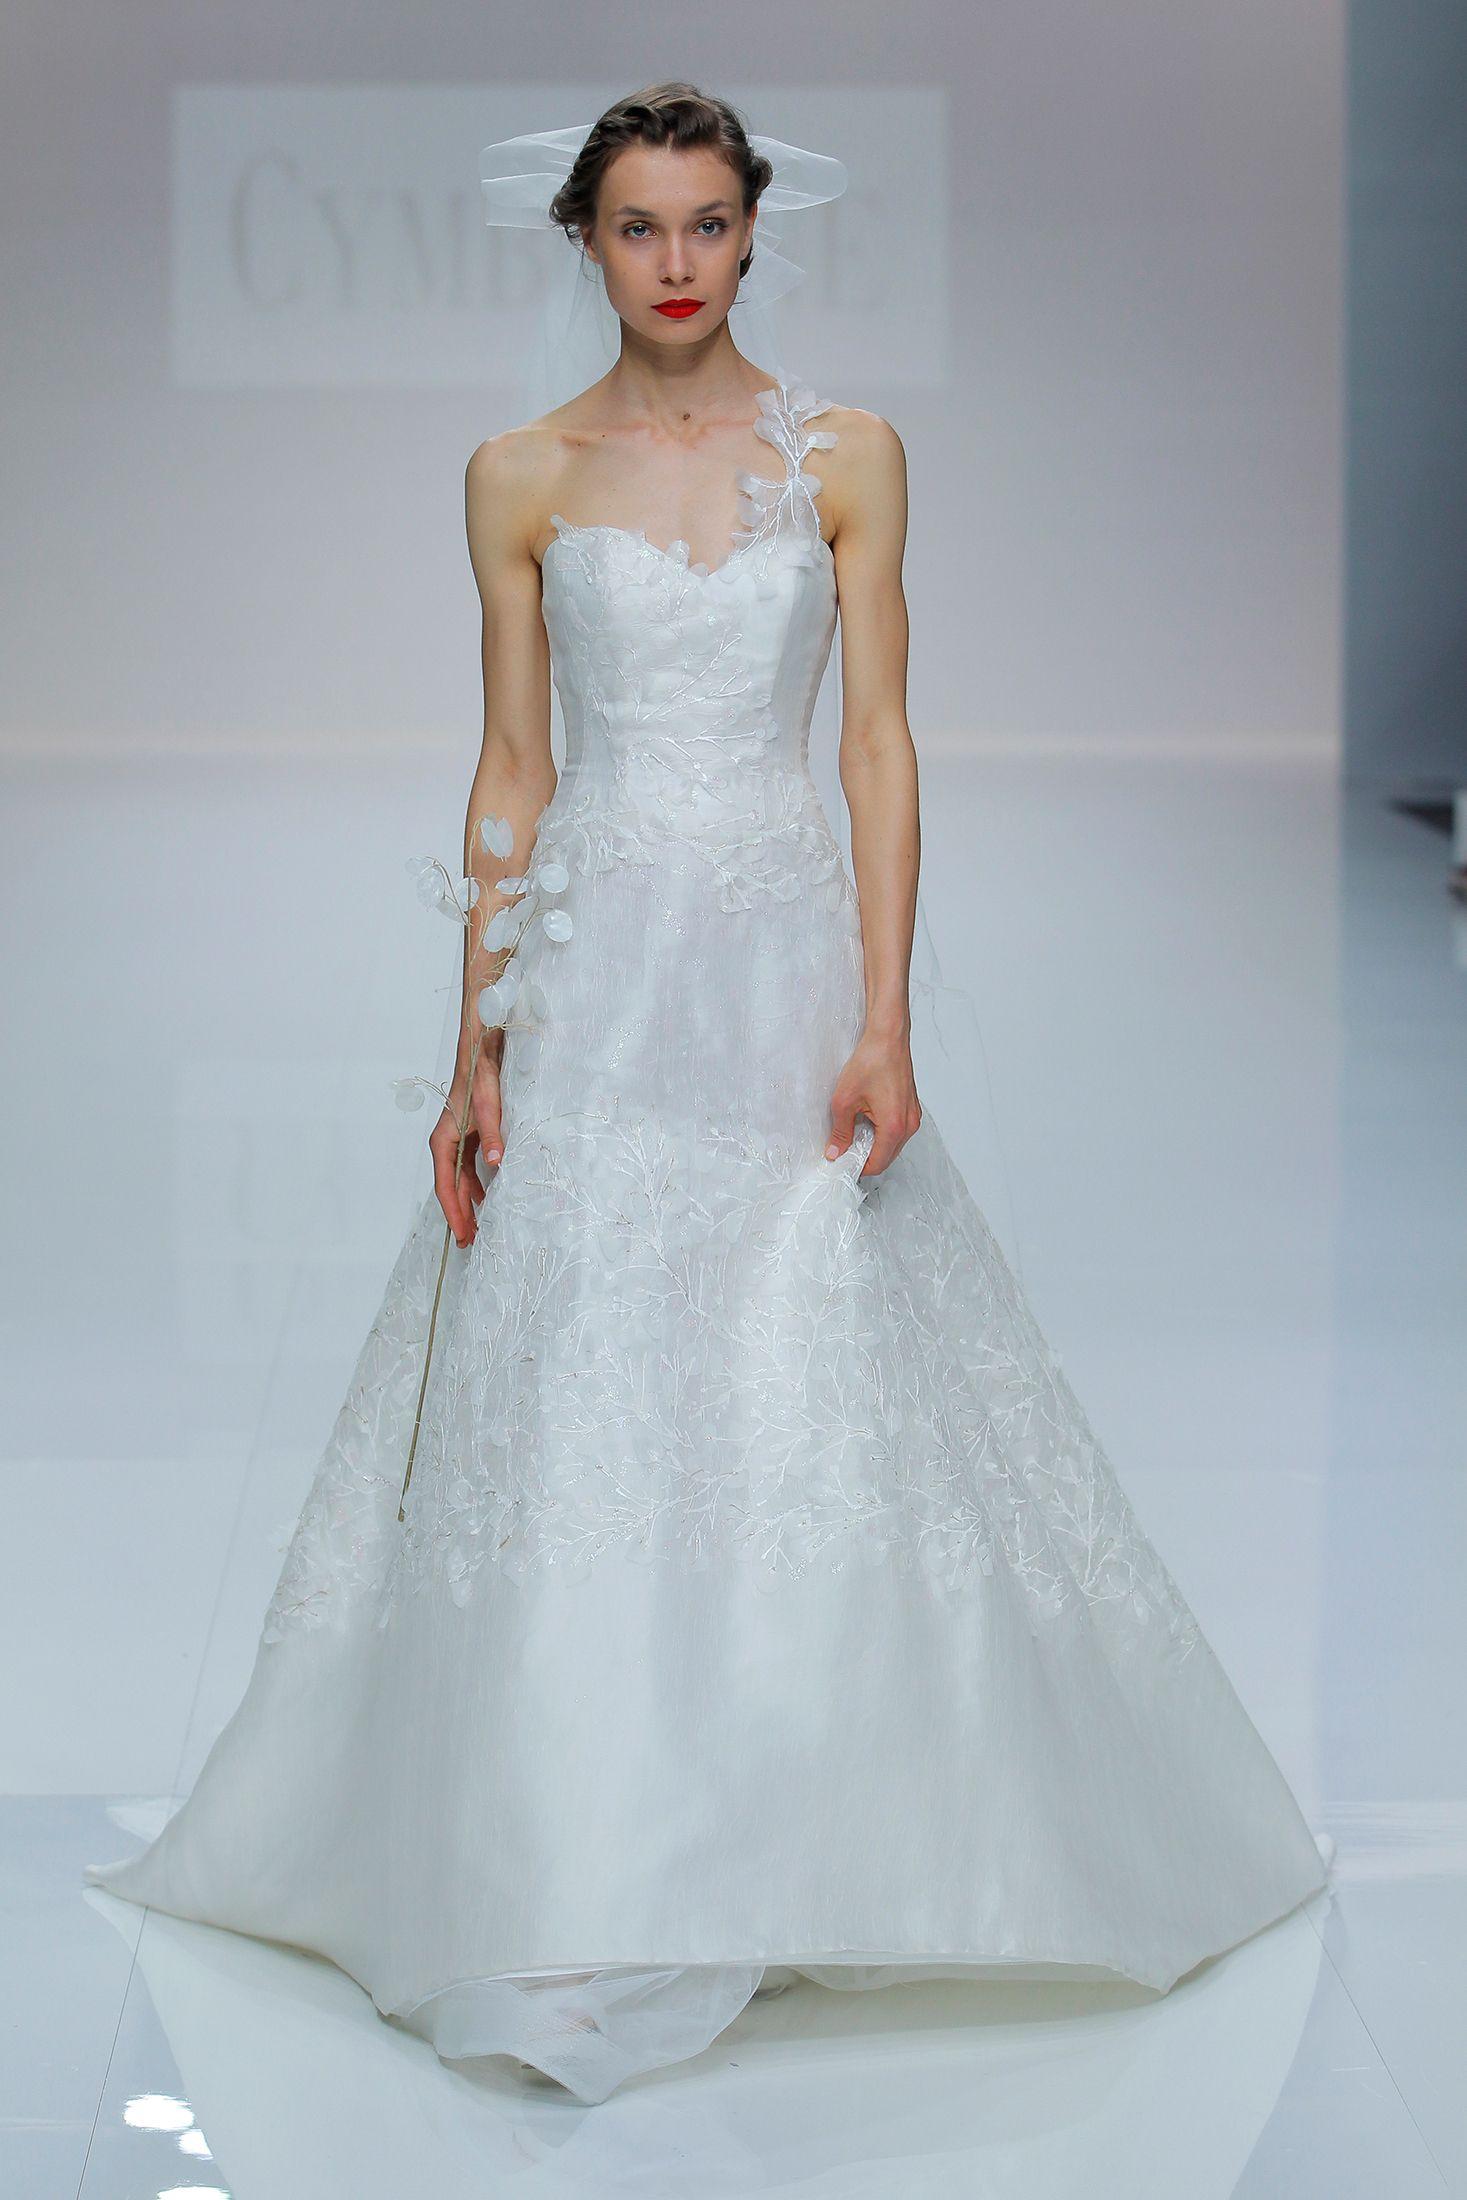 Vestido de Novia de Cymbeline - CY 091 #wedding #bodas #boda ...